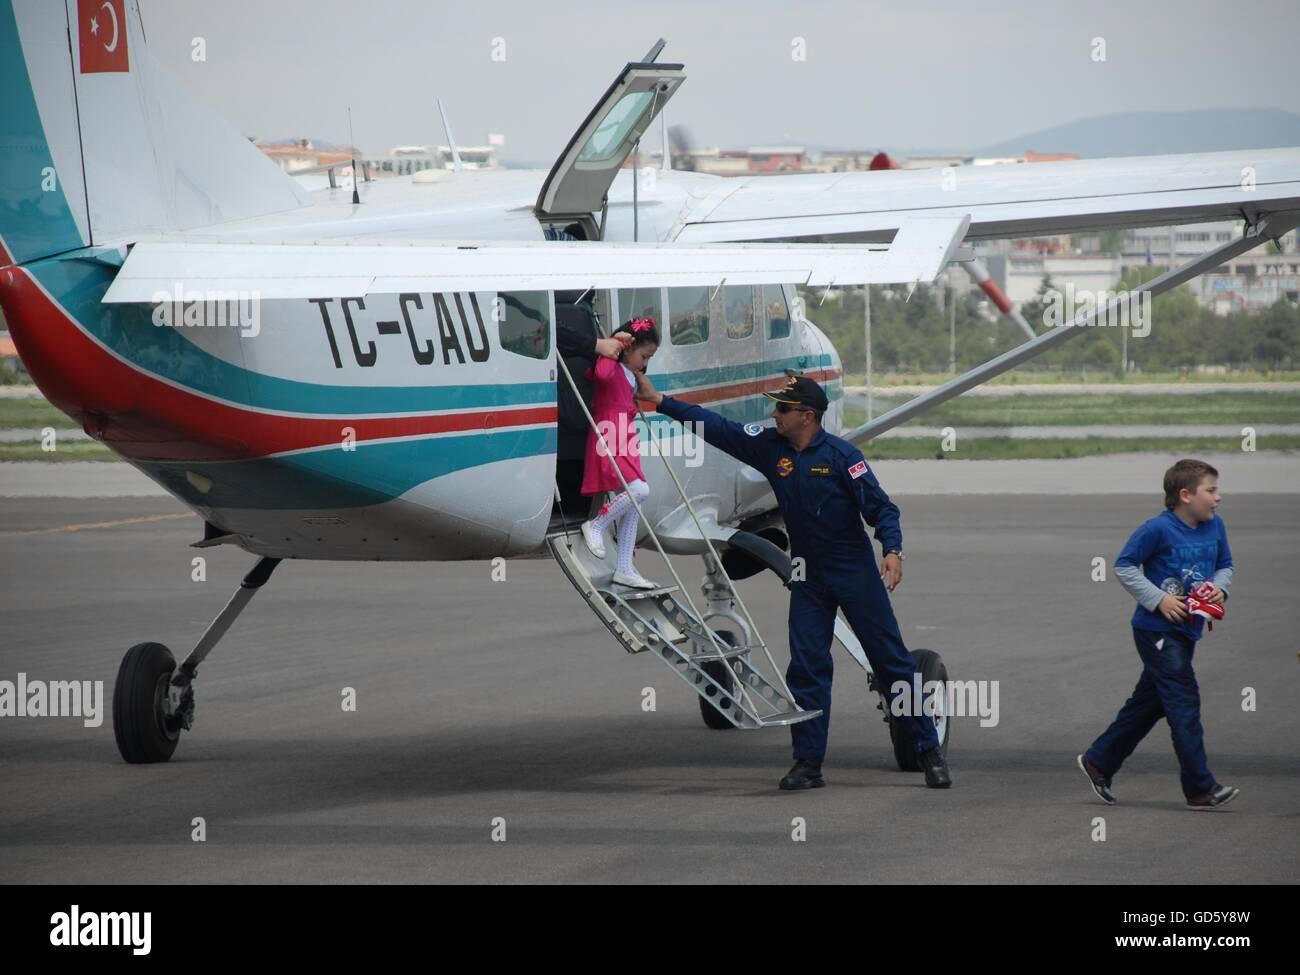 Cessna 206 Caravan aircraft at the Turkish Air Association-THK's Etimesgut Airport during the Air fest - Stock Image